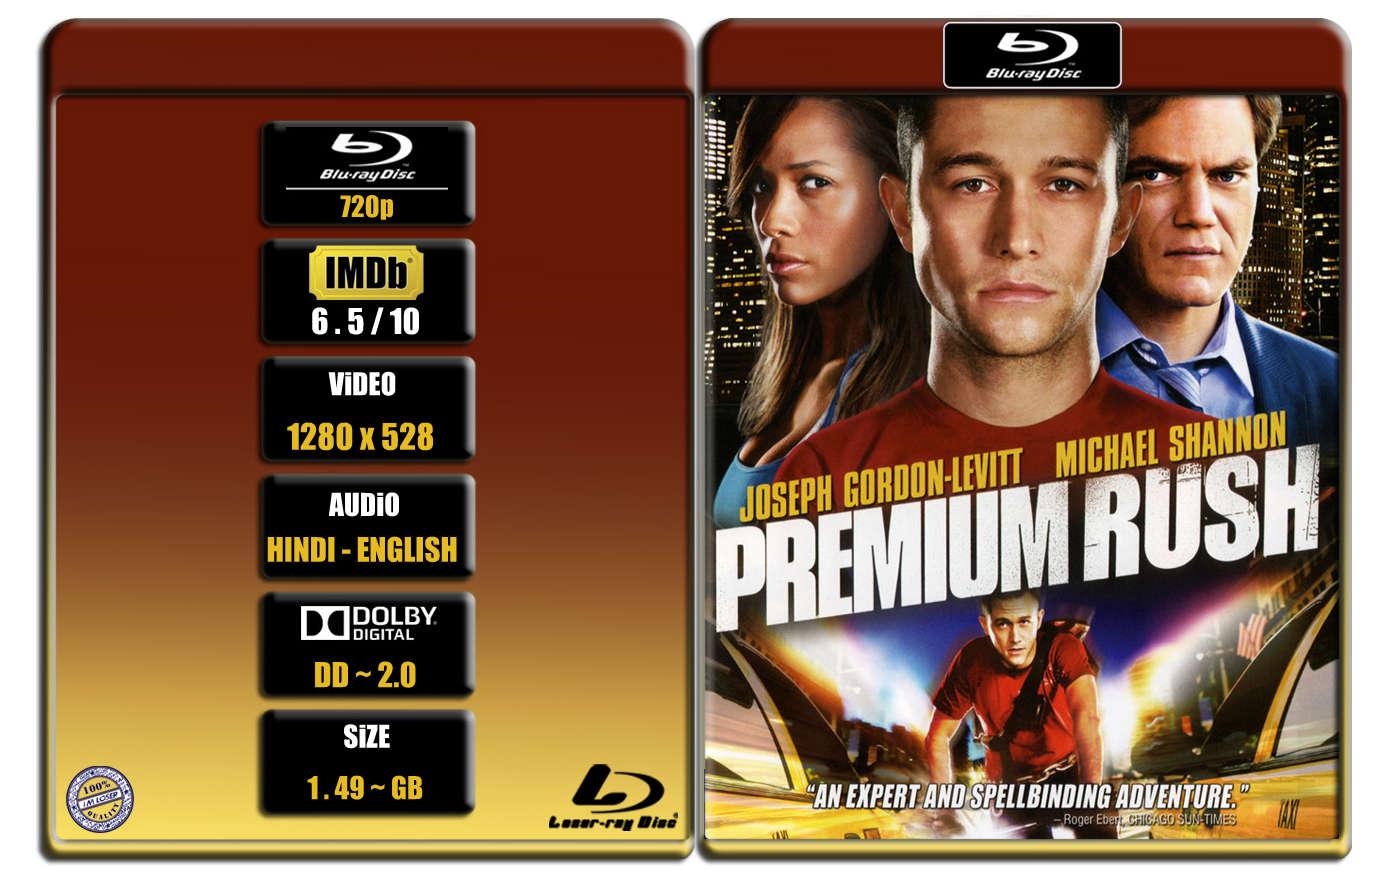 Premium Rush [2012] 720p BR Rip x264 [DD 2.0] [HINDI ENG] ® Im Loser ®